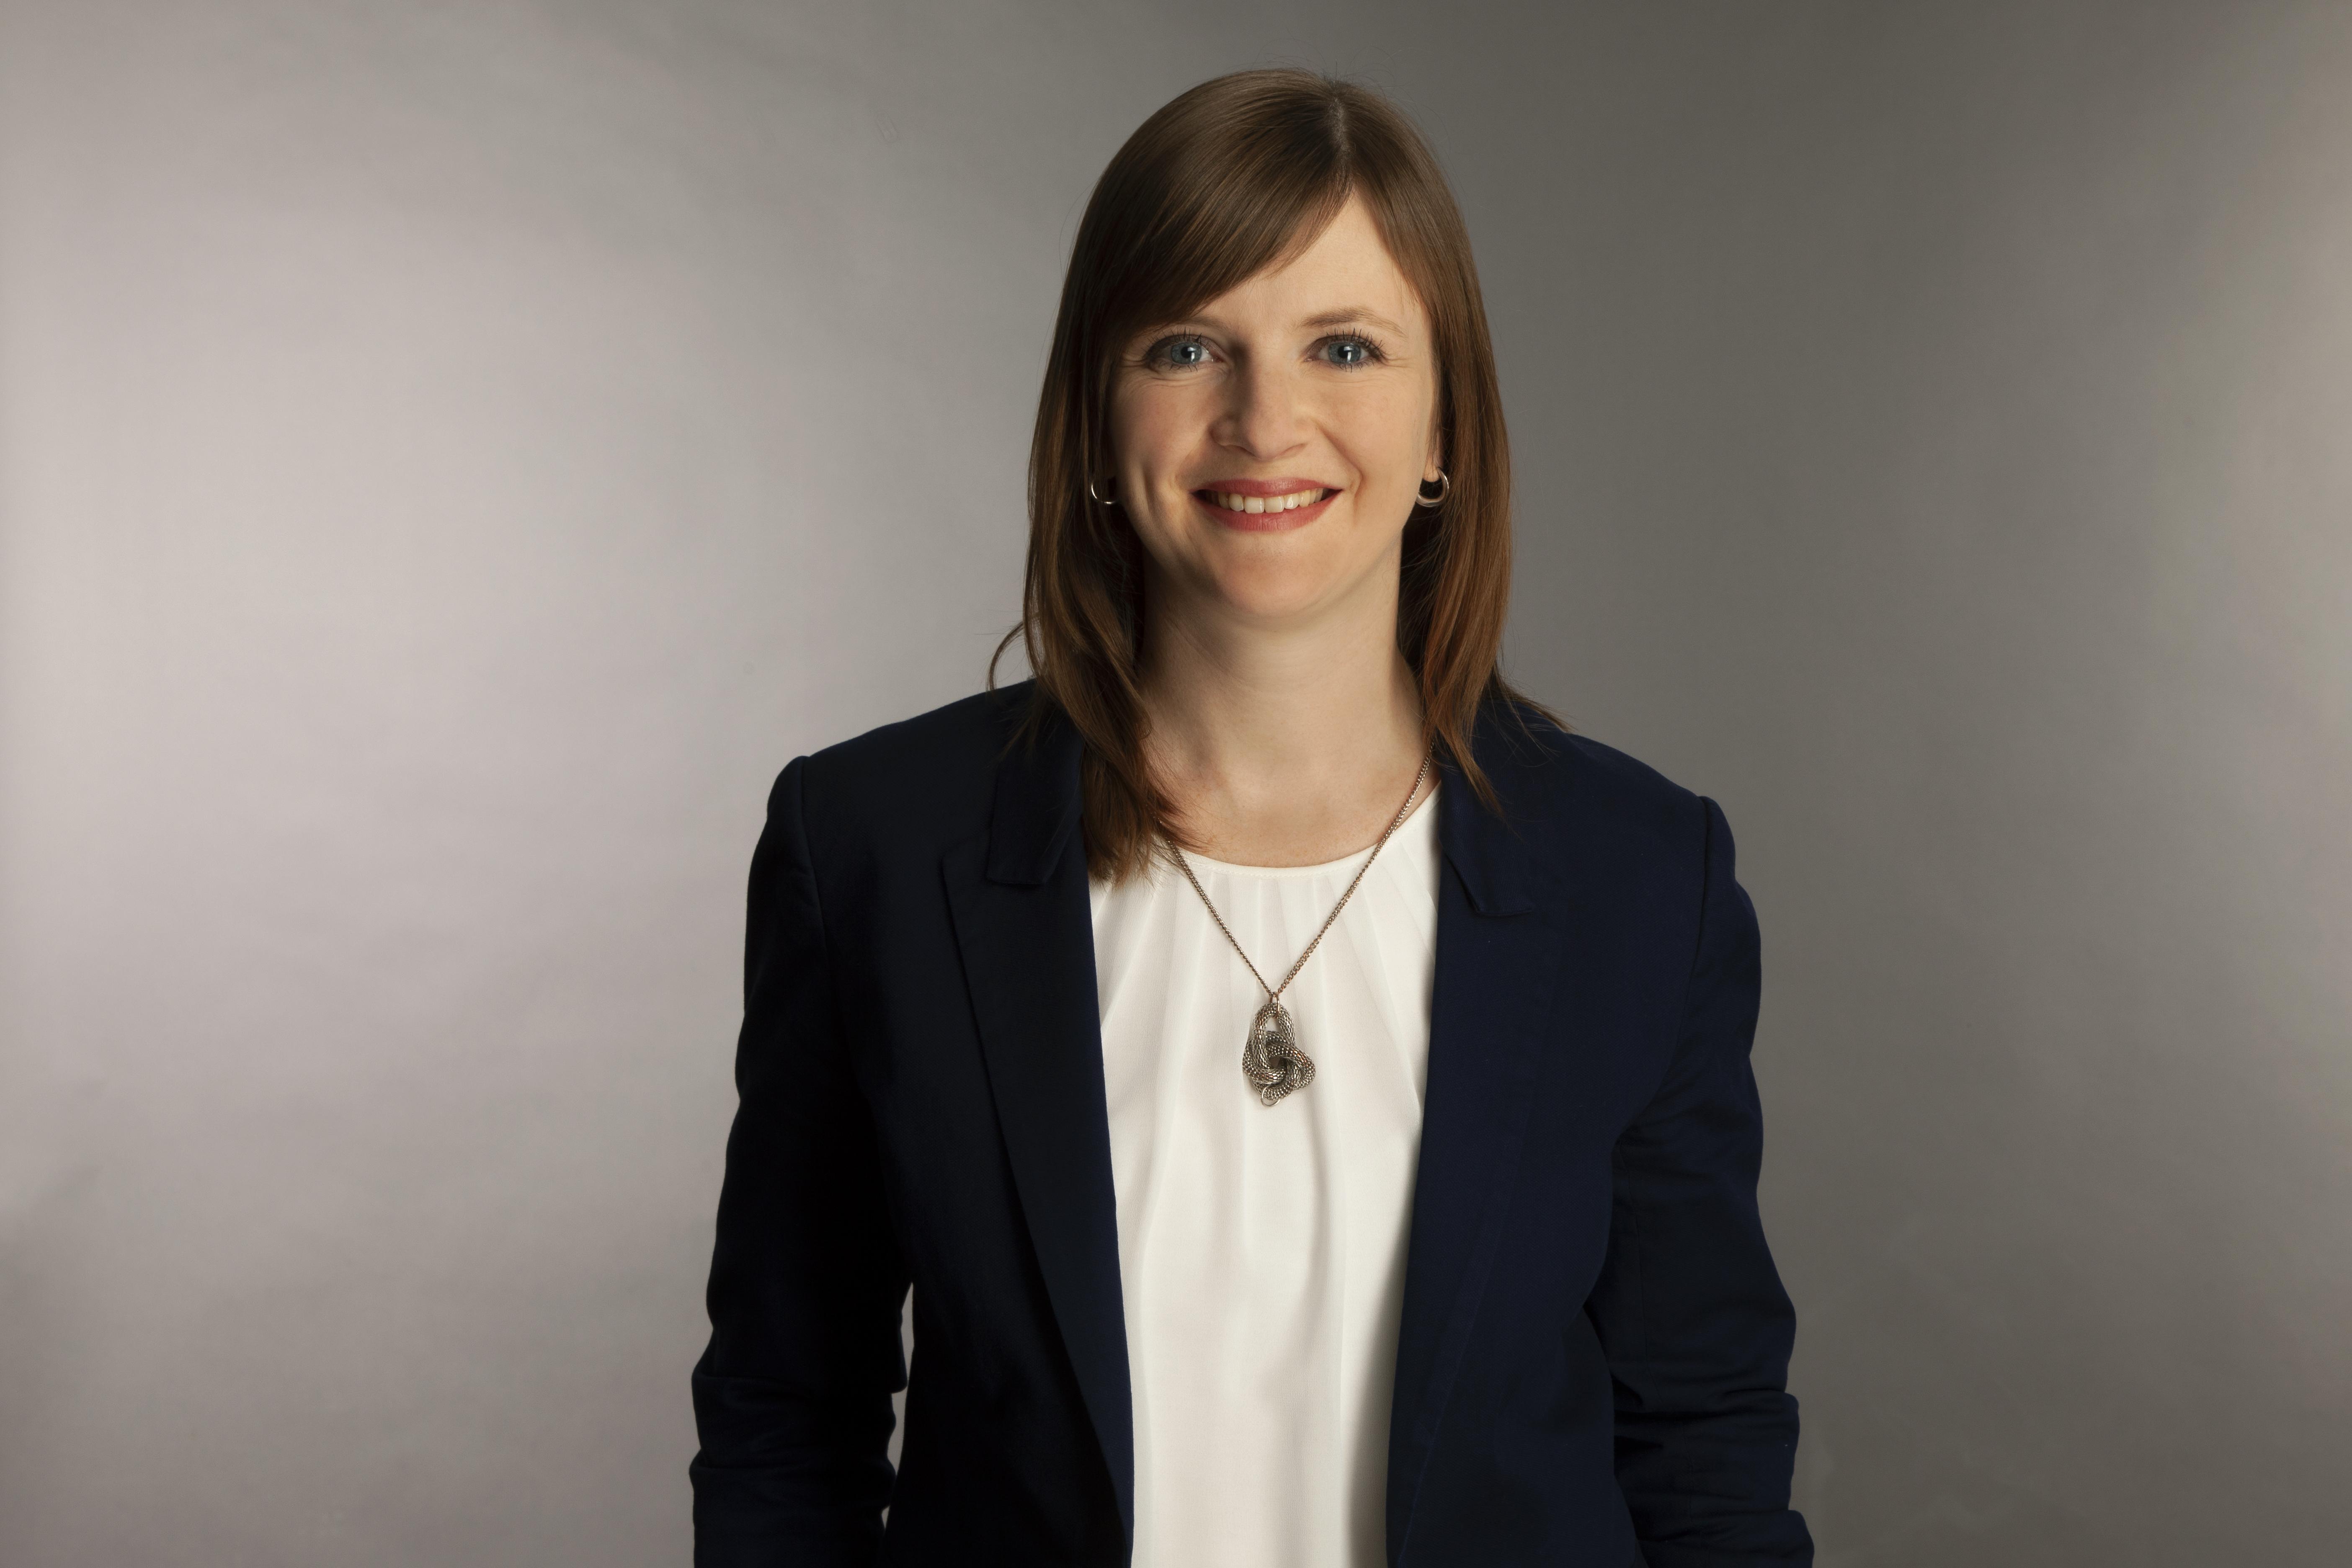 Erste Bürgermeisterin Annika Popp